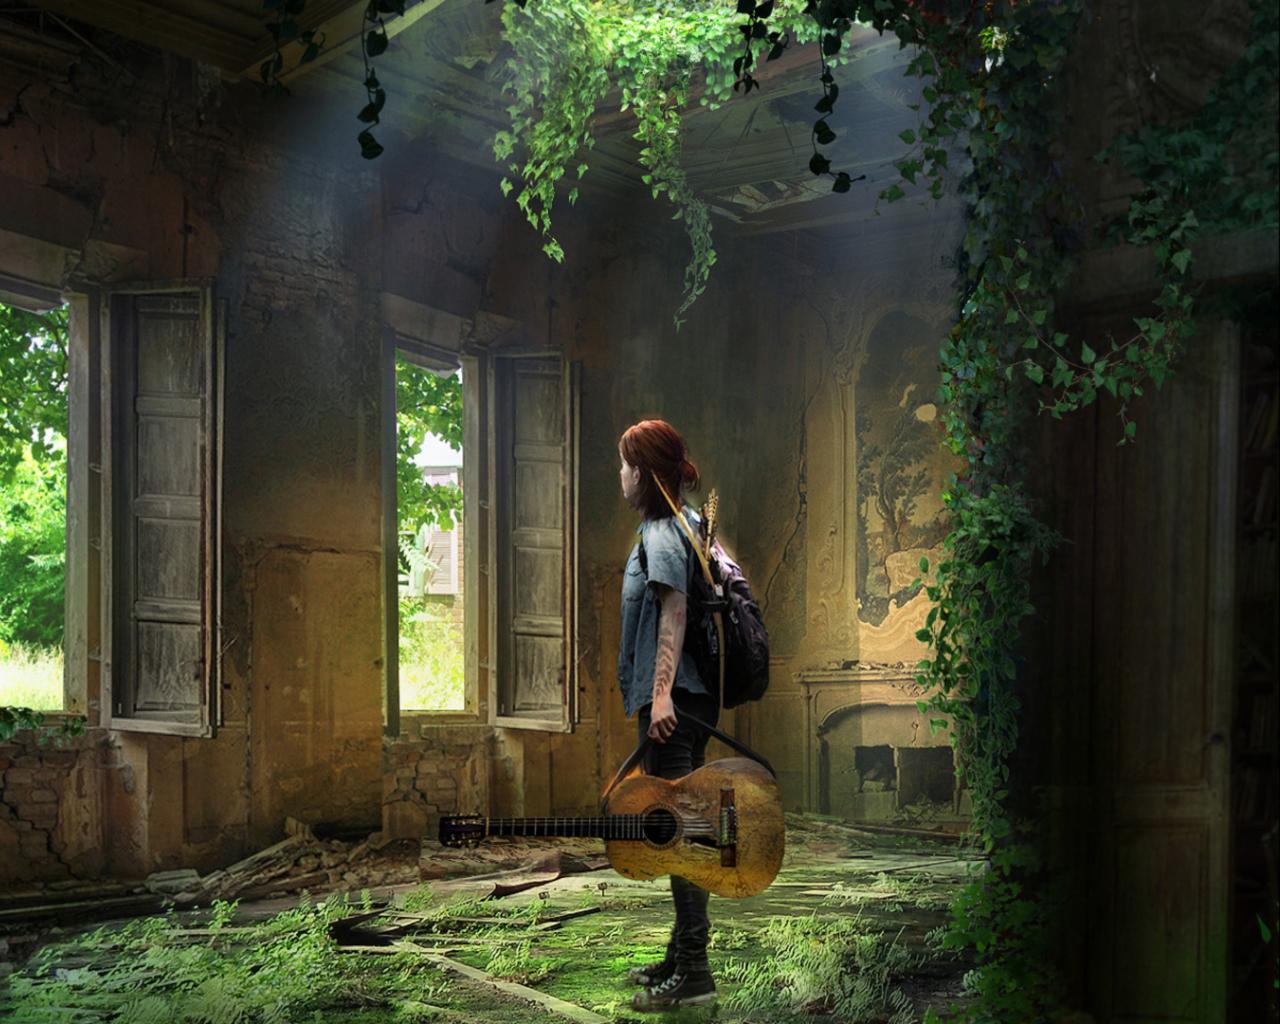 1280x1024 Ellie The Last Of Us 1280x1024 Resolution Wallpaper Hd